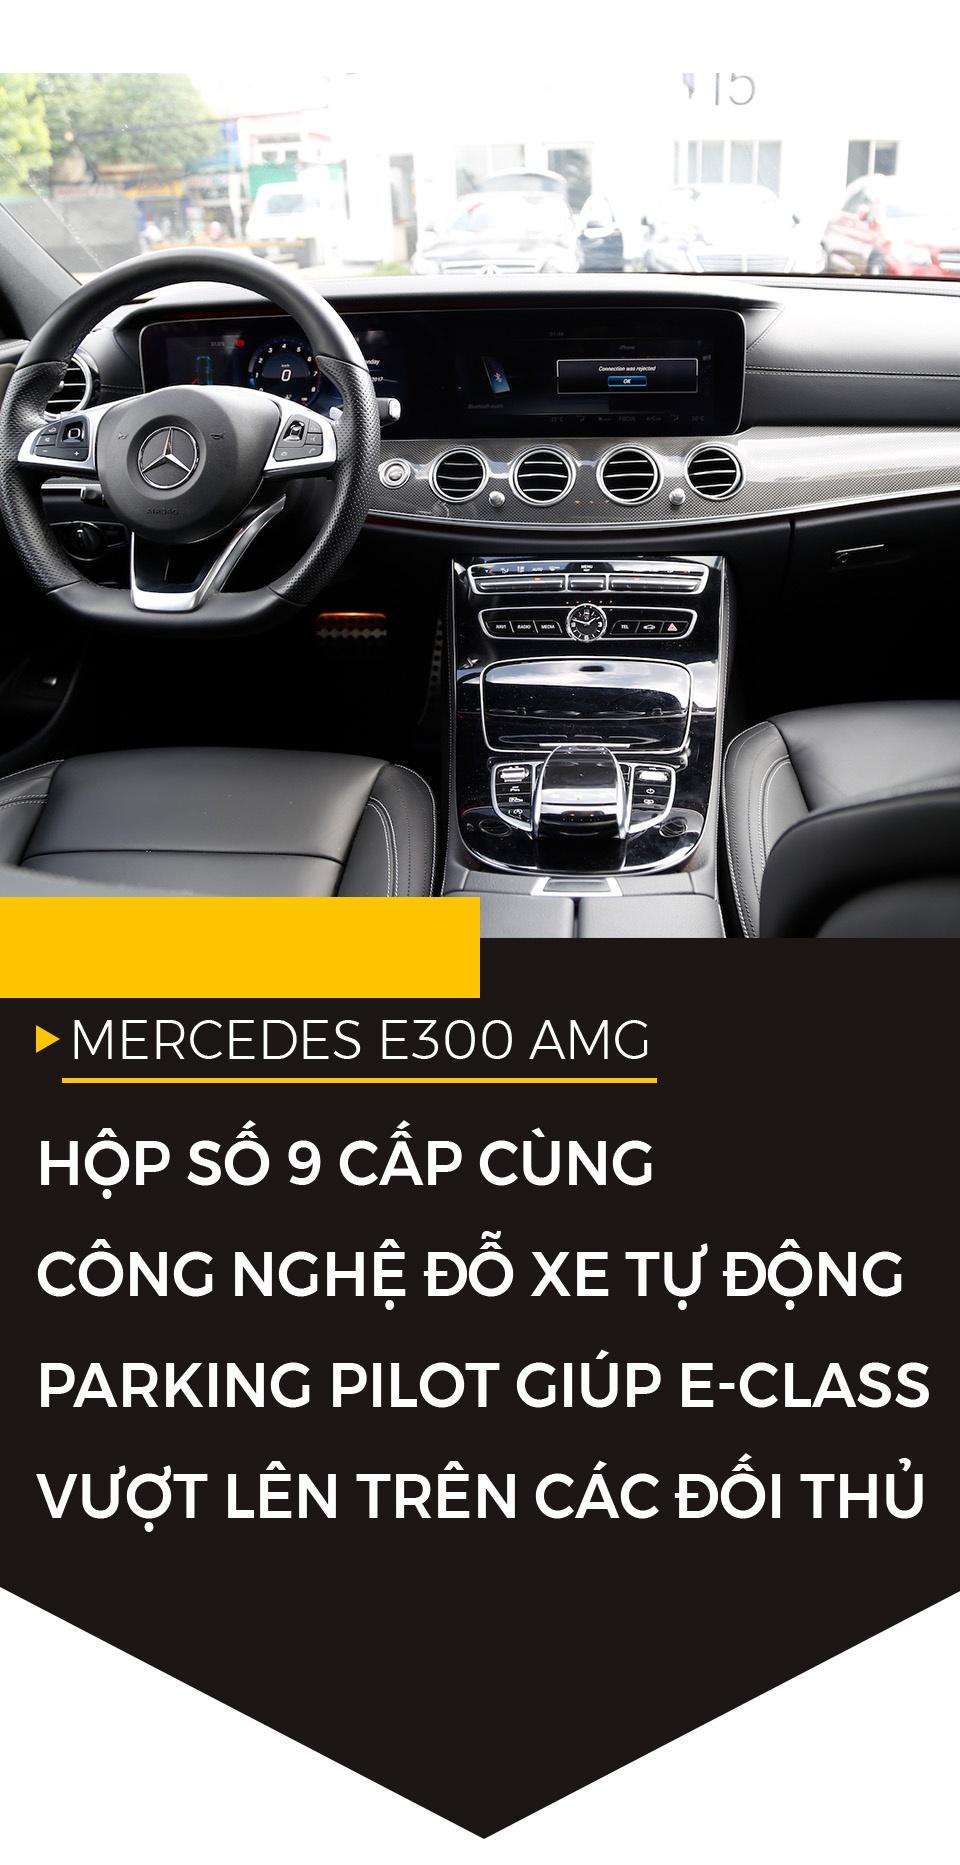 Danh gia Mercedes E300 AMG tai Viet Nam anh 7